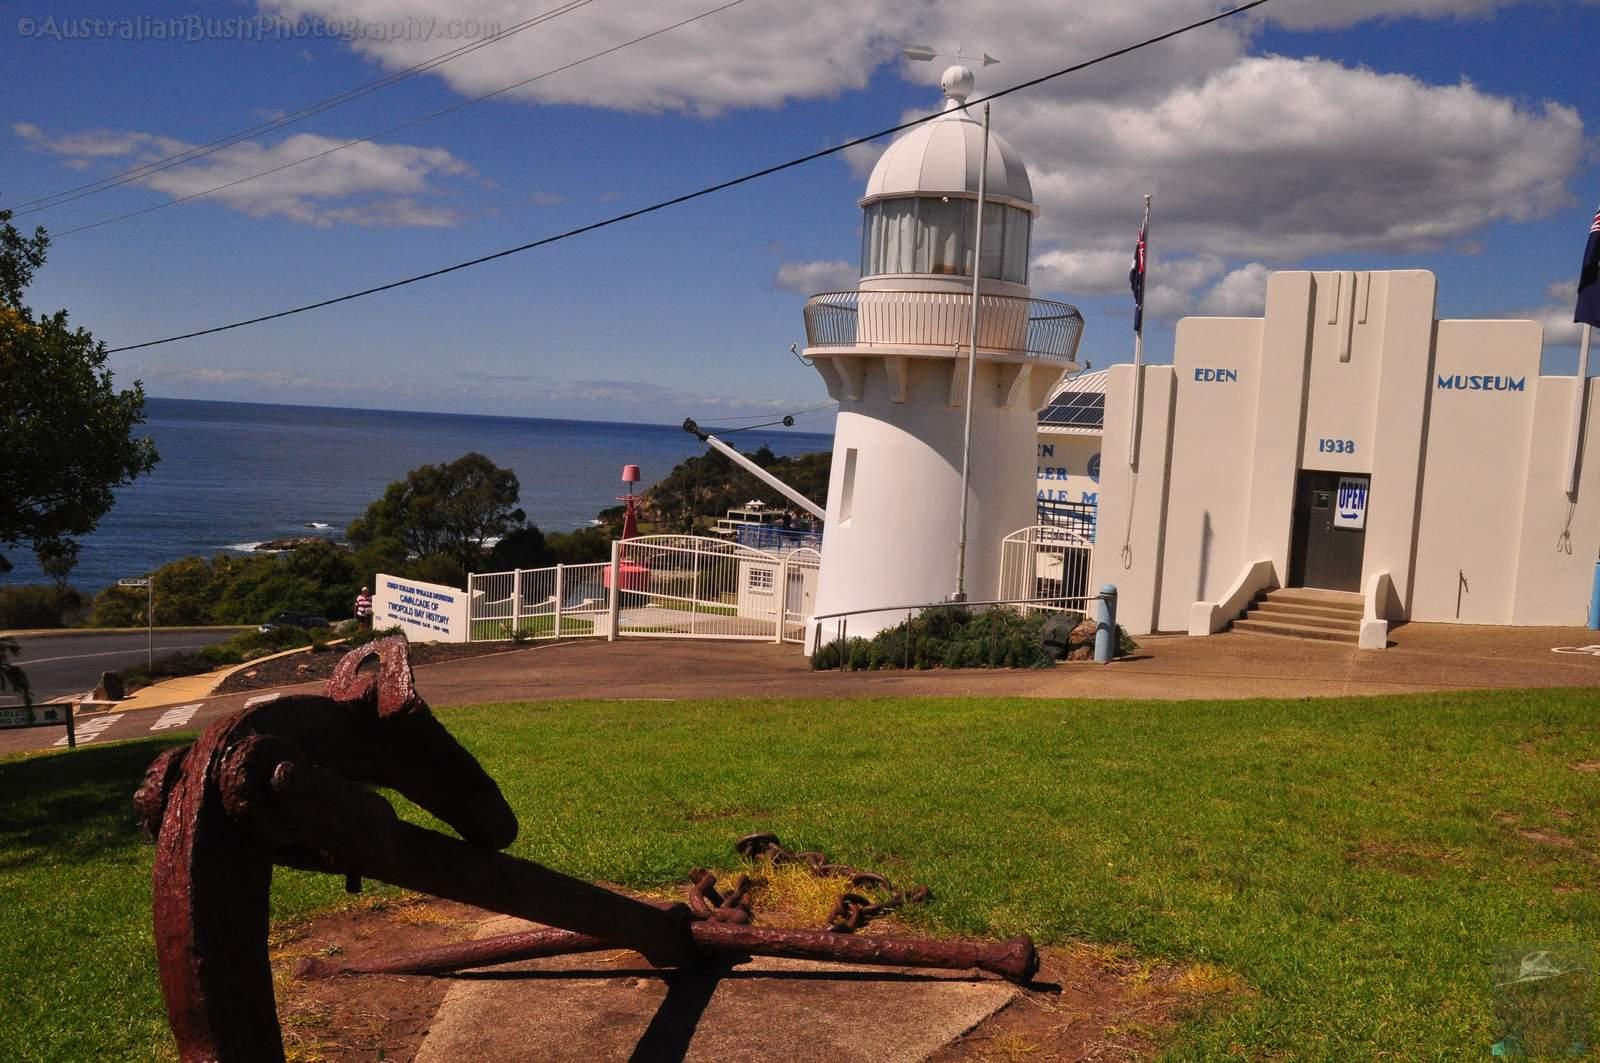 Melbourne to Brisbane 4 – Eden's Killer Whale Museum